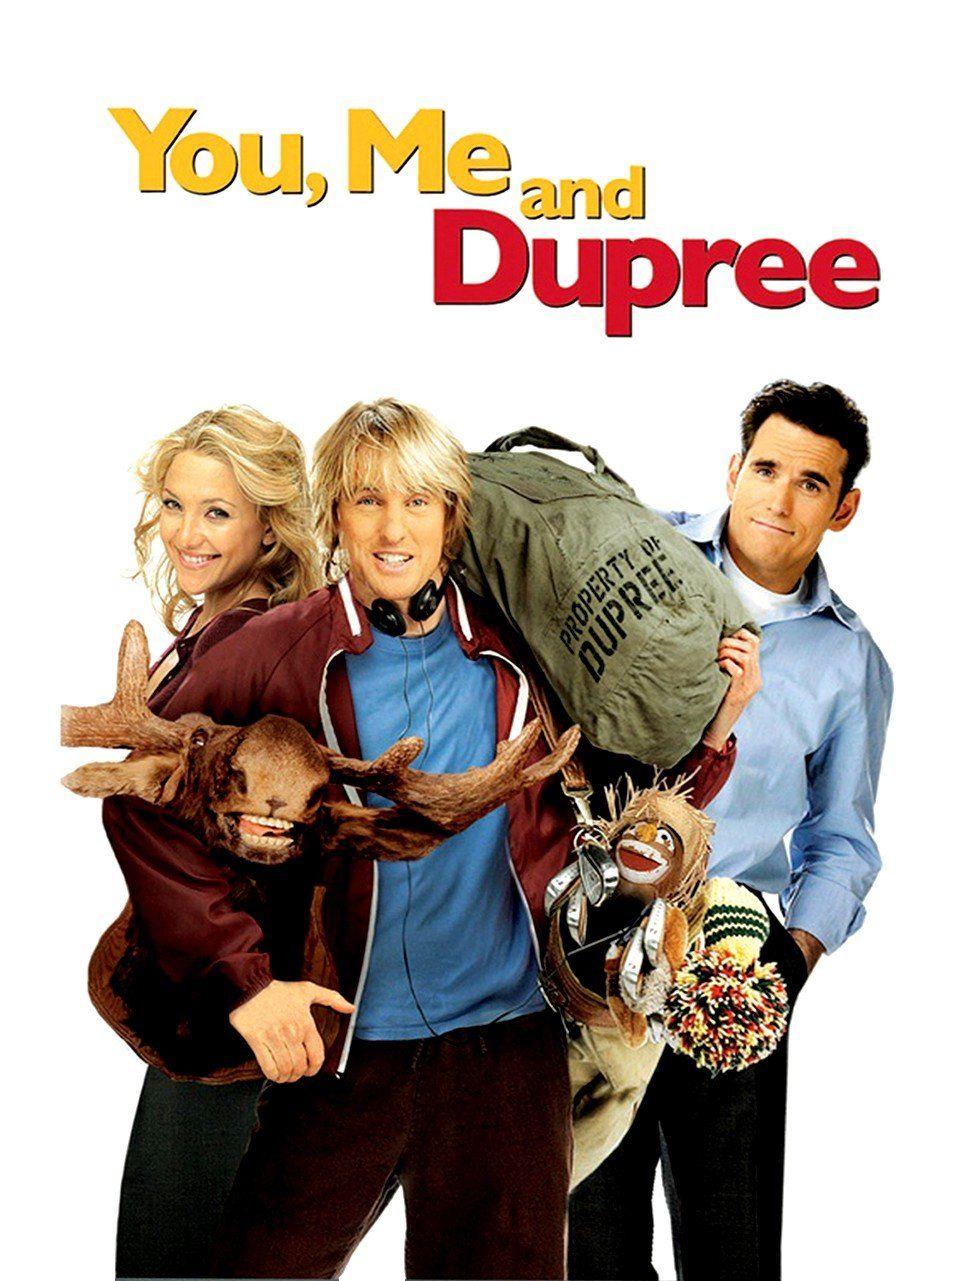 You, Me and Dupree (2006) Dual Audio BluRay 1080p [Hindi ORG – English] ESubs